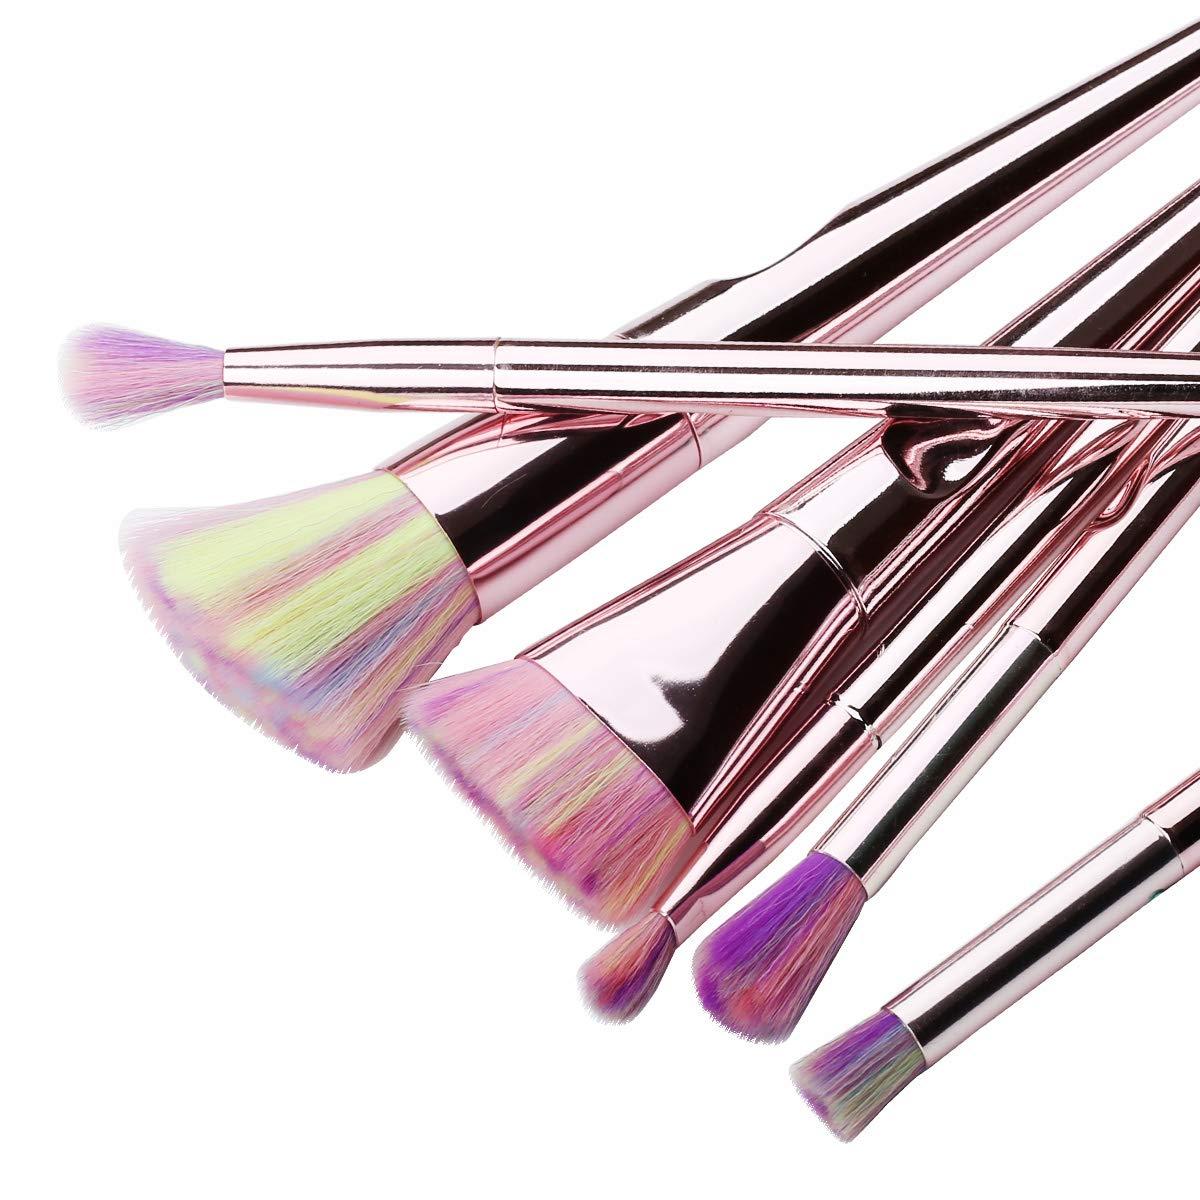 Cosmetic Brushes set Foundation Powder Concealers Eyeshadows Makeup 10 Pcs Brush Set, Rose Golden